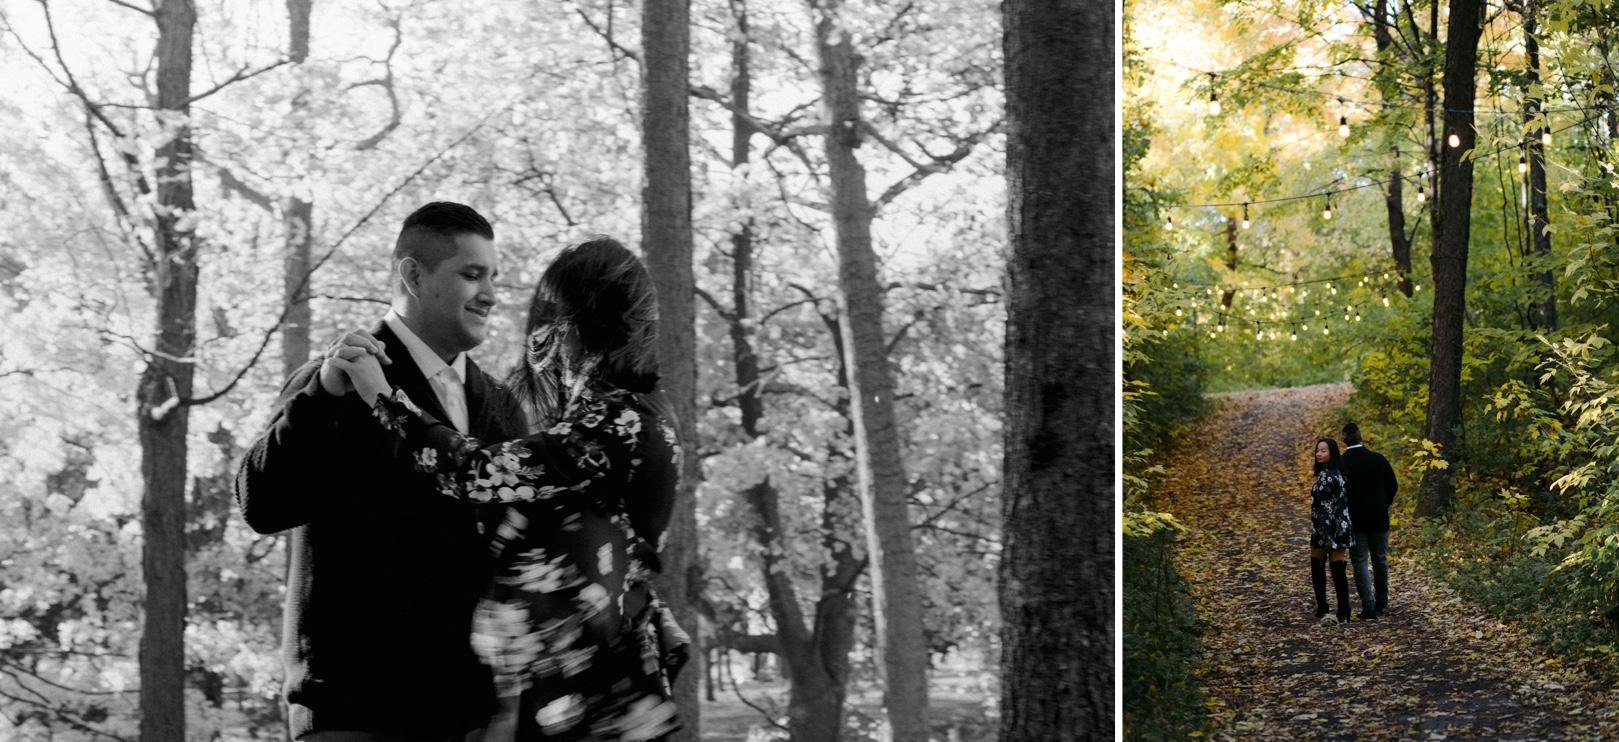 37_ENGMNT ELISE ALEX-192_ENGMNT ELISE ALEX-507_Events_Engagement_2018_Travel_Weddings_Photography_best_Portraits.jpg